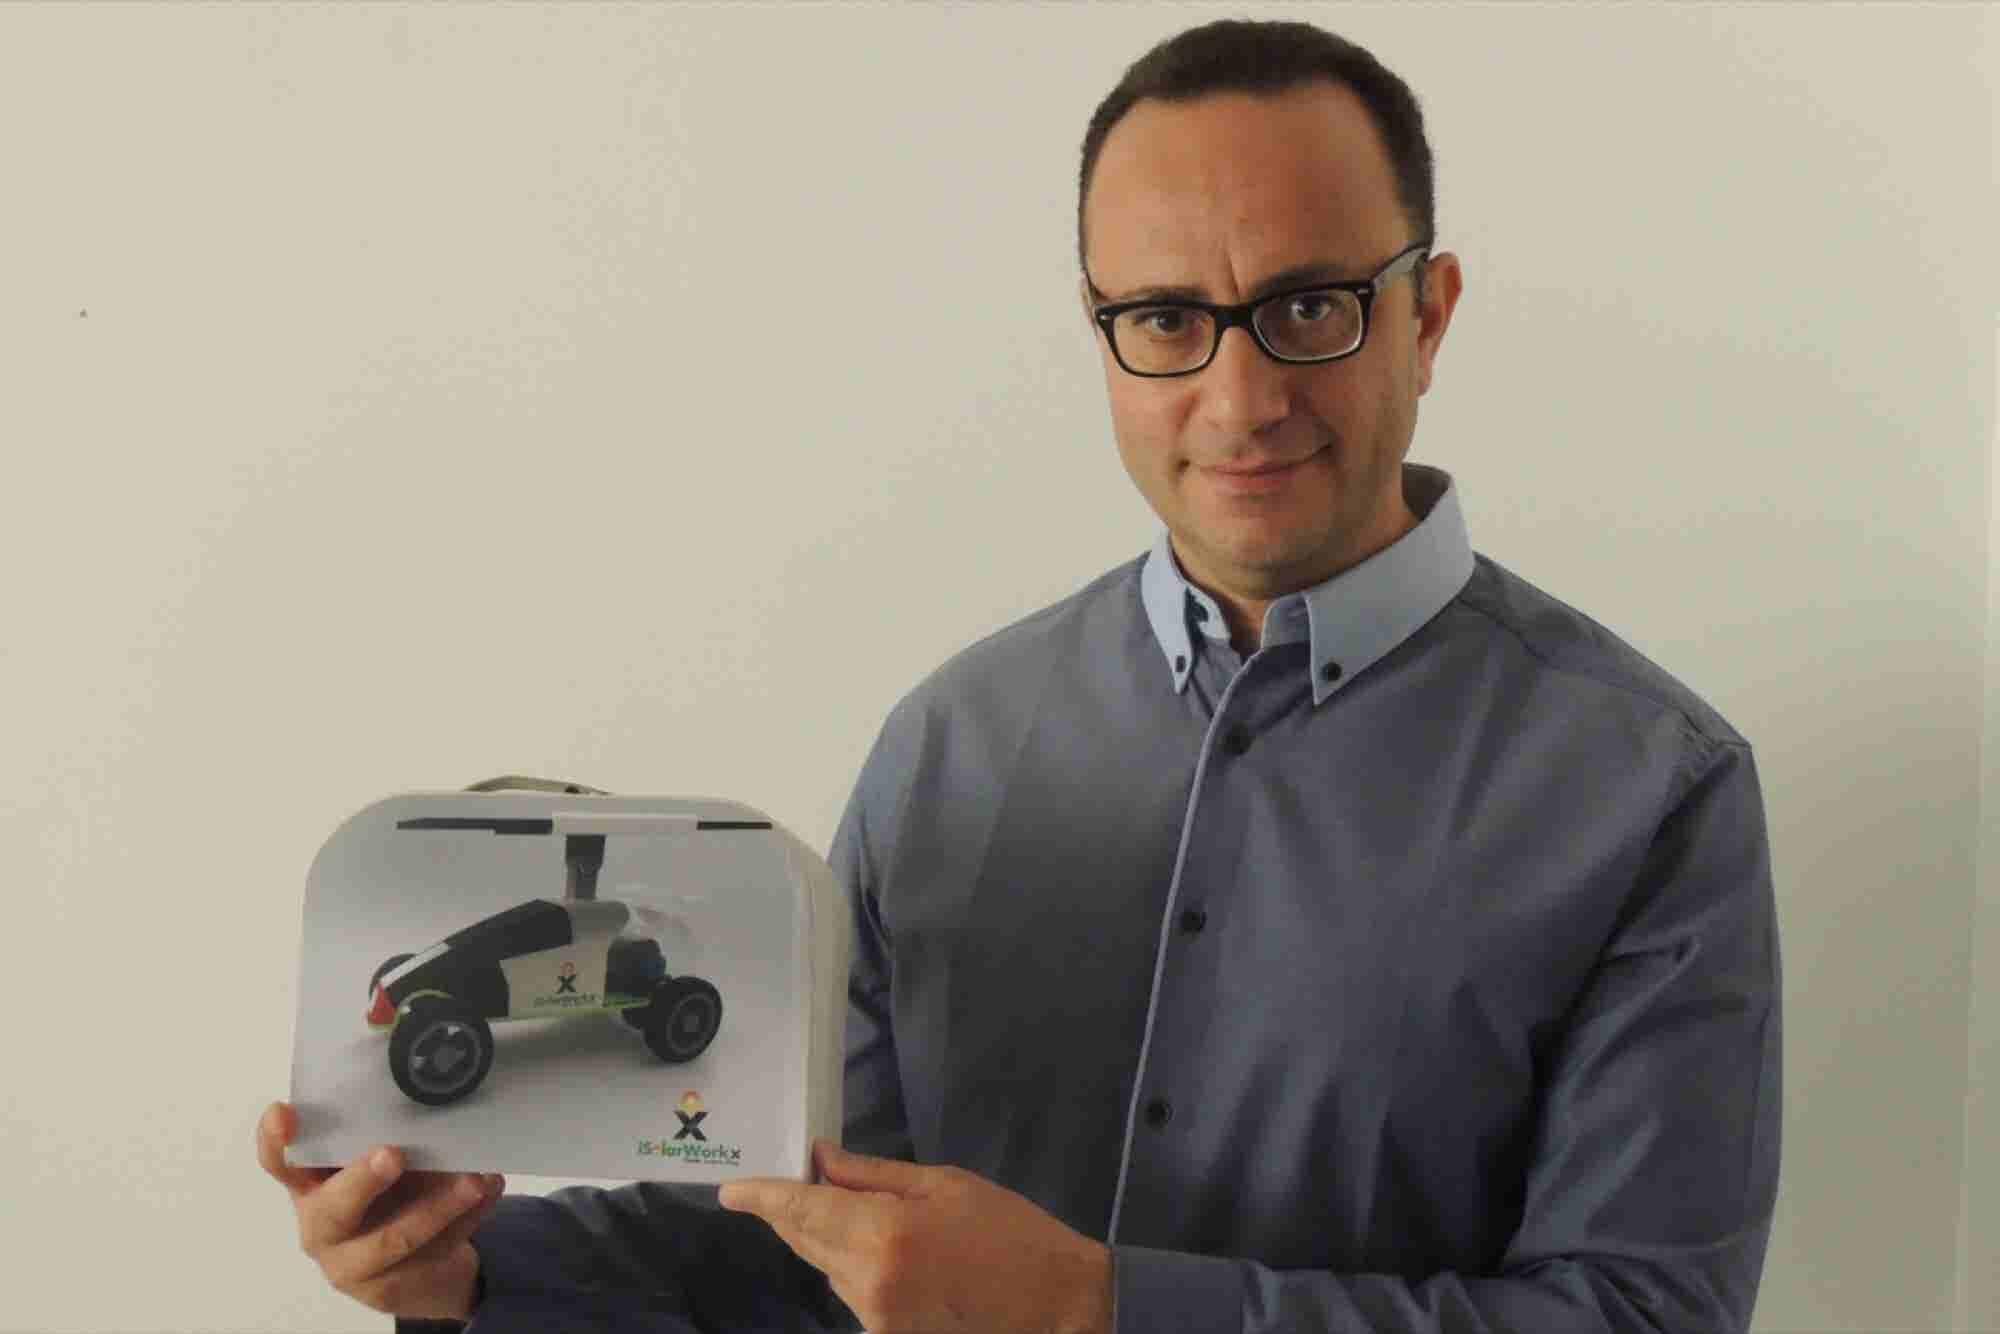 Five Minutes With Entrepreneur Ali Abdel Hafiz, Founder, iSolarWorkx